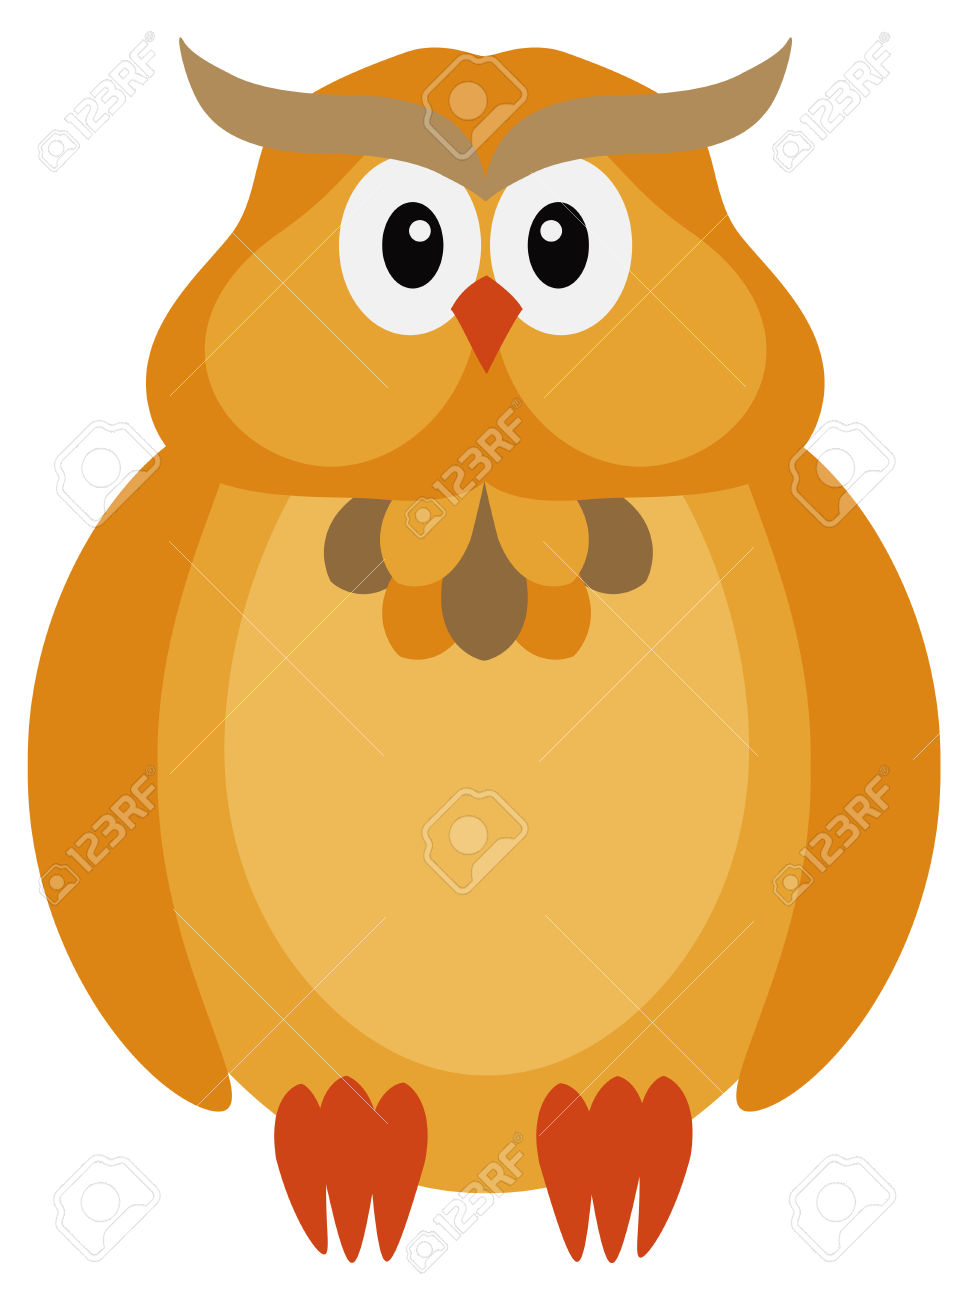 Happy Halloween Orange Fall Color Tone Cute Cartoon Owl Isolated.